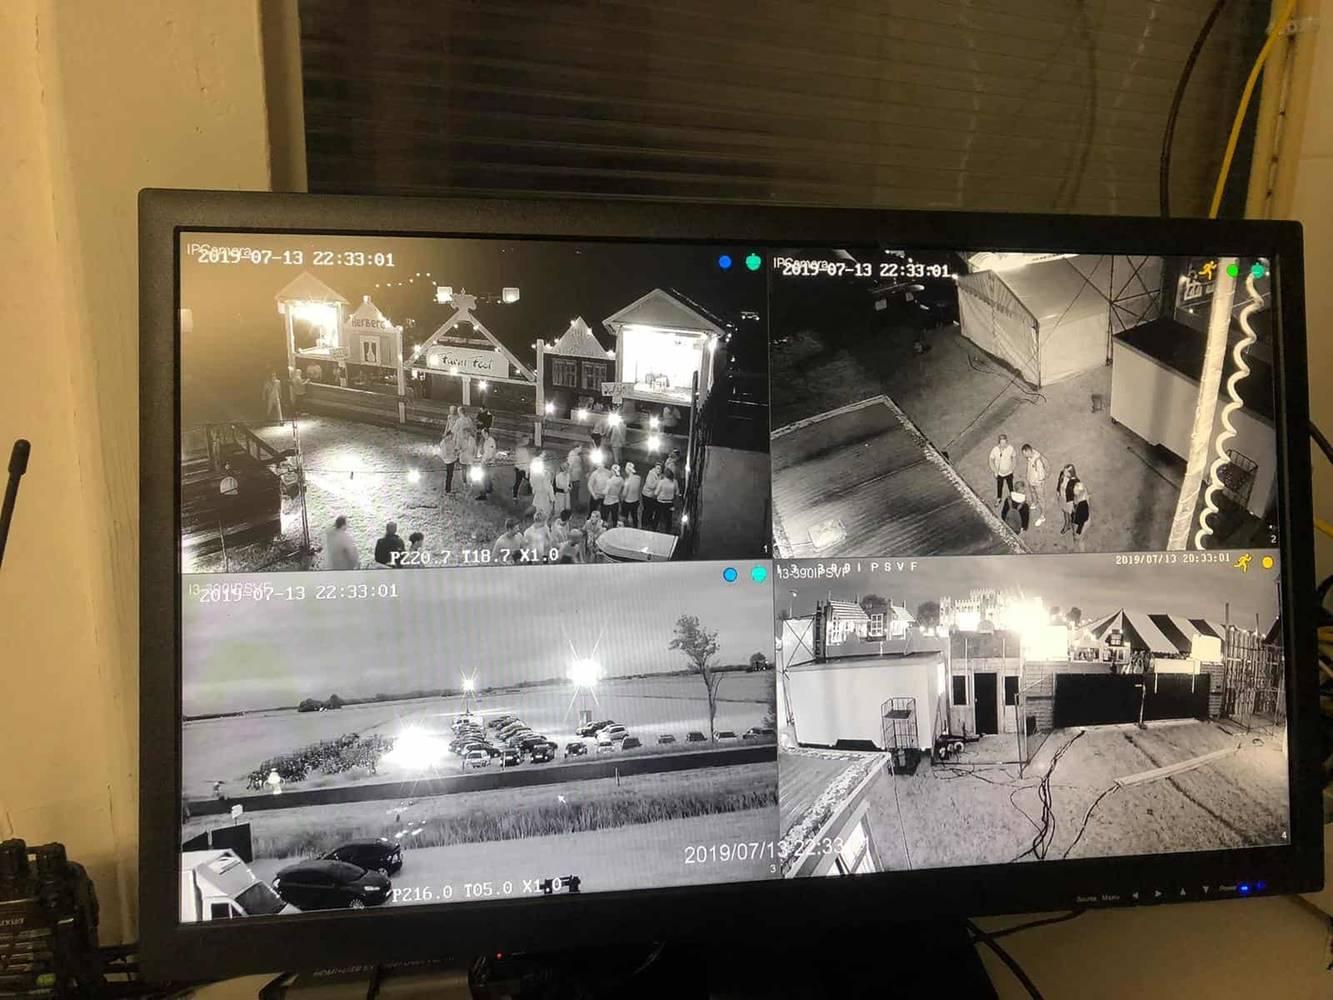 Camera beveiliging. Duurzame en veilige oplossing